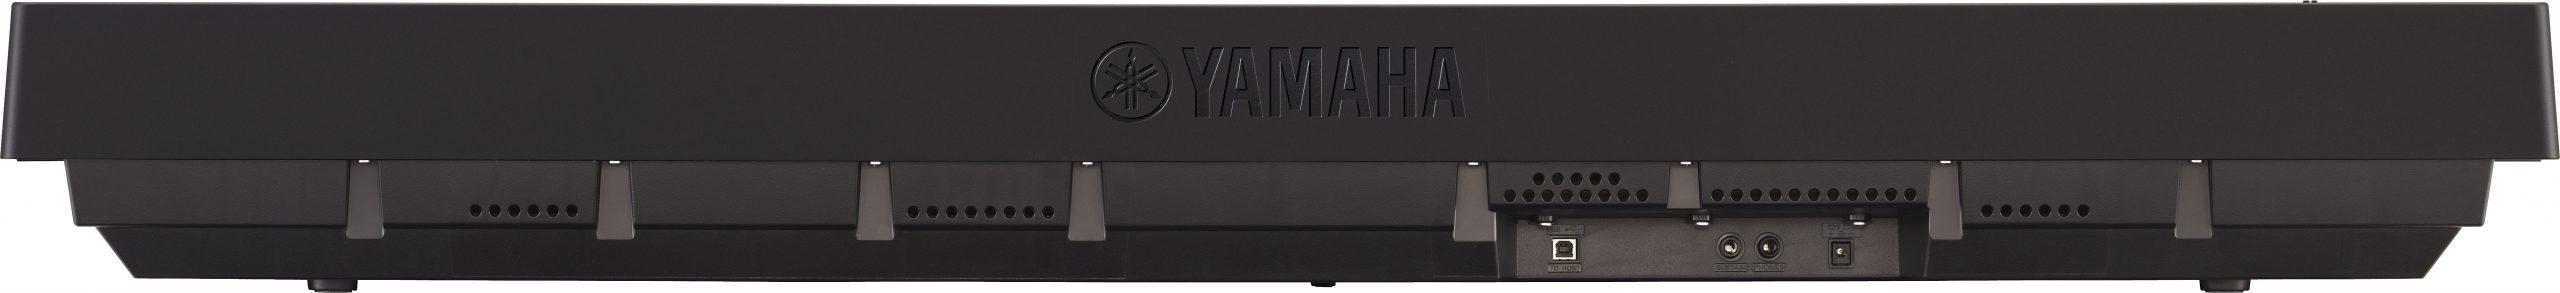 YAMAHA P45 PIANO DIGITALE 88 TAS PESATI 1